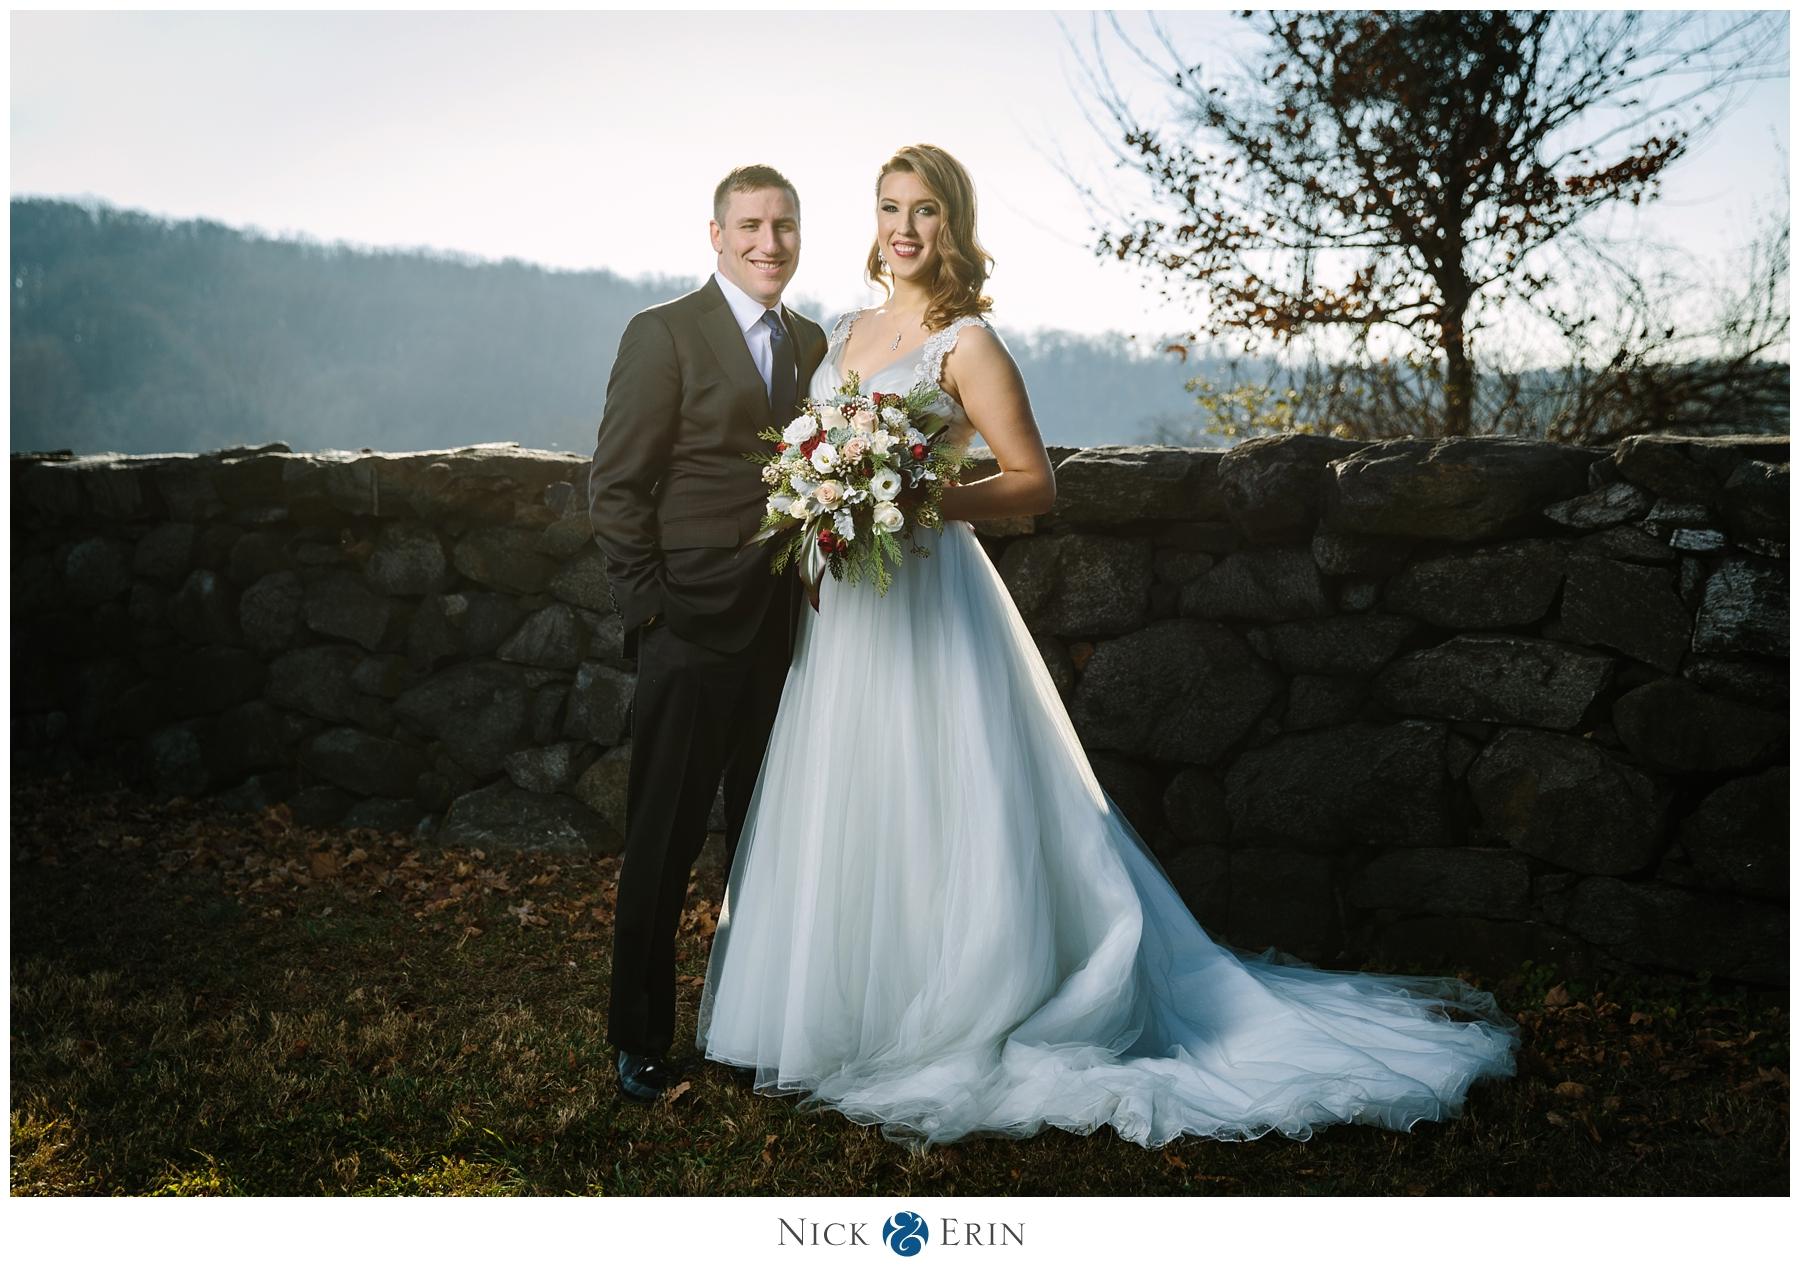 Donner_Photography_Mendenhall Inn Wedding_Blake & Kristina_0004